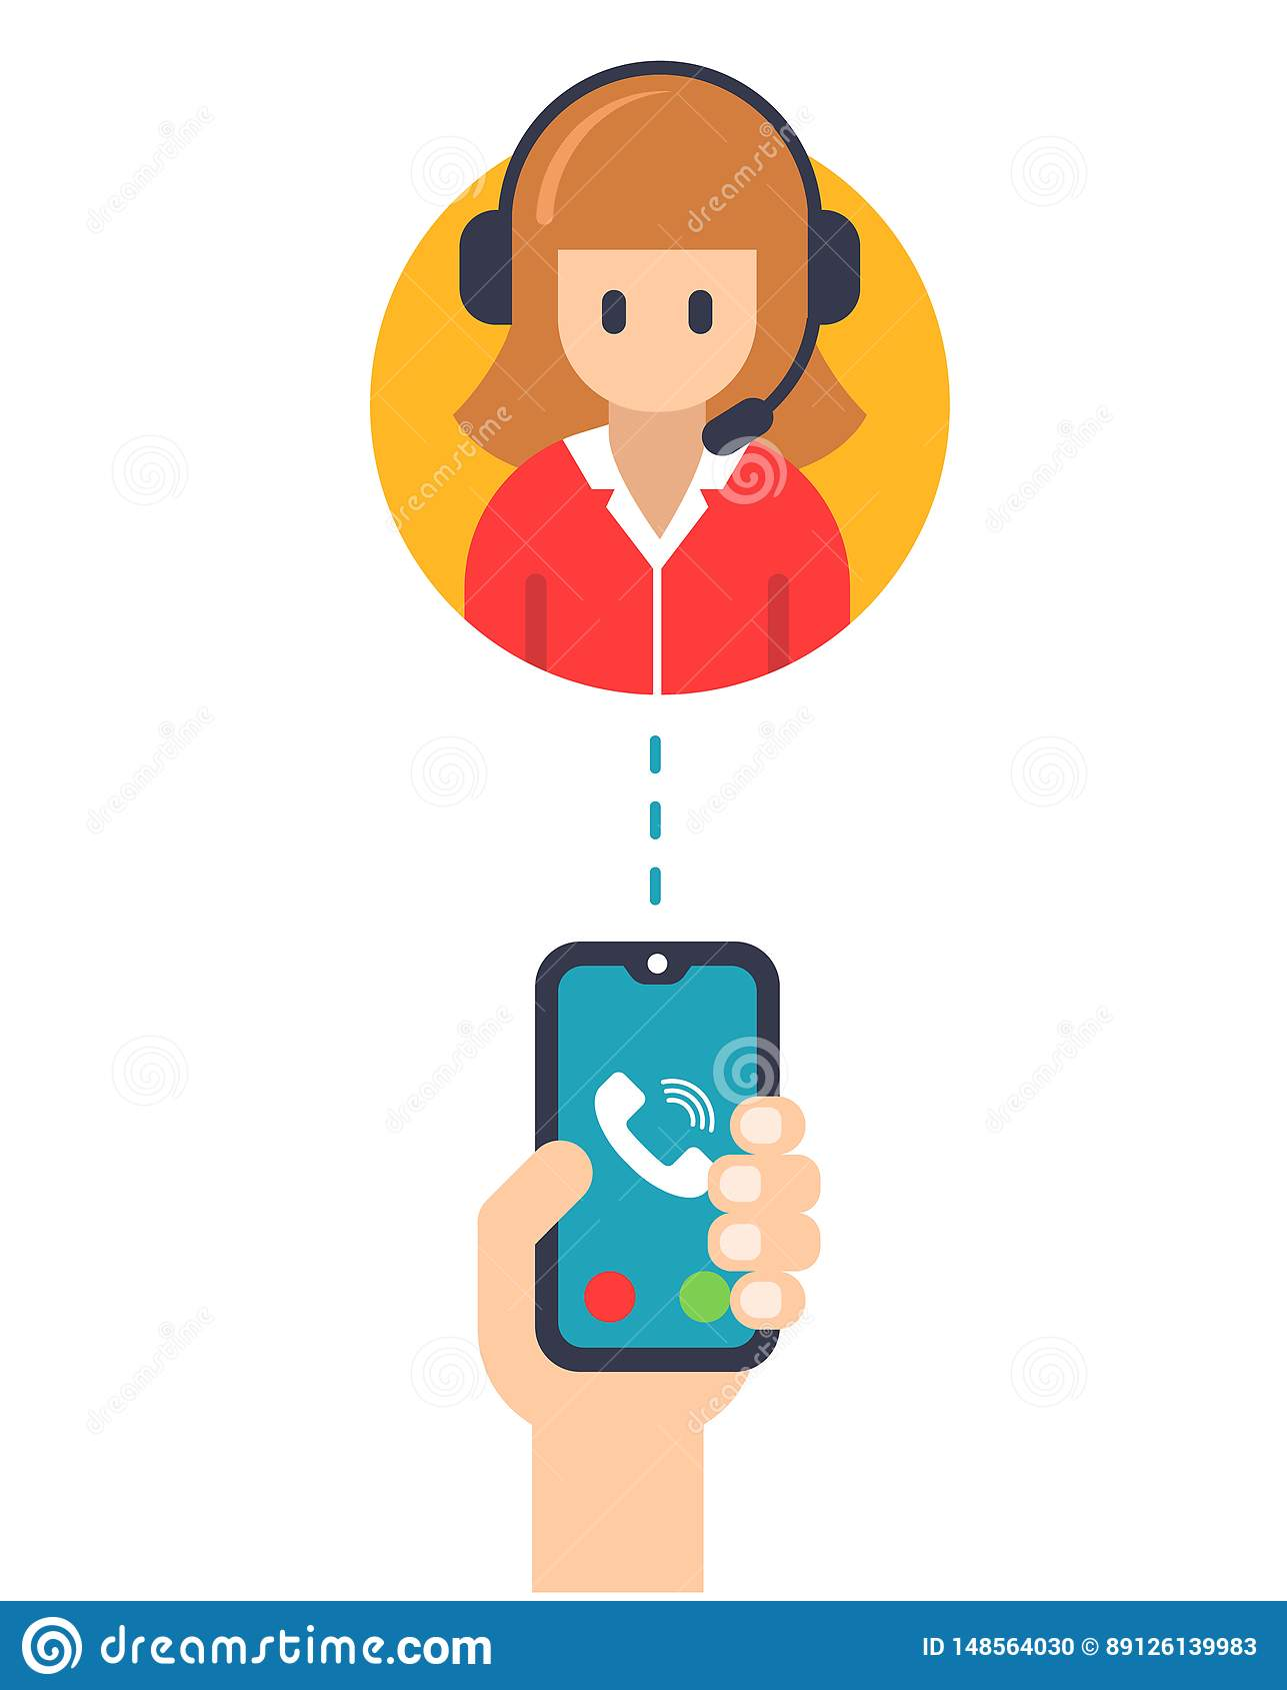 Сервис-менеджер звонка от мобильного телефона